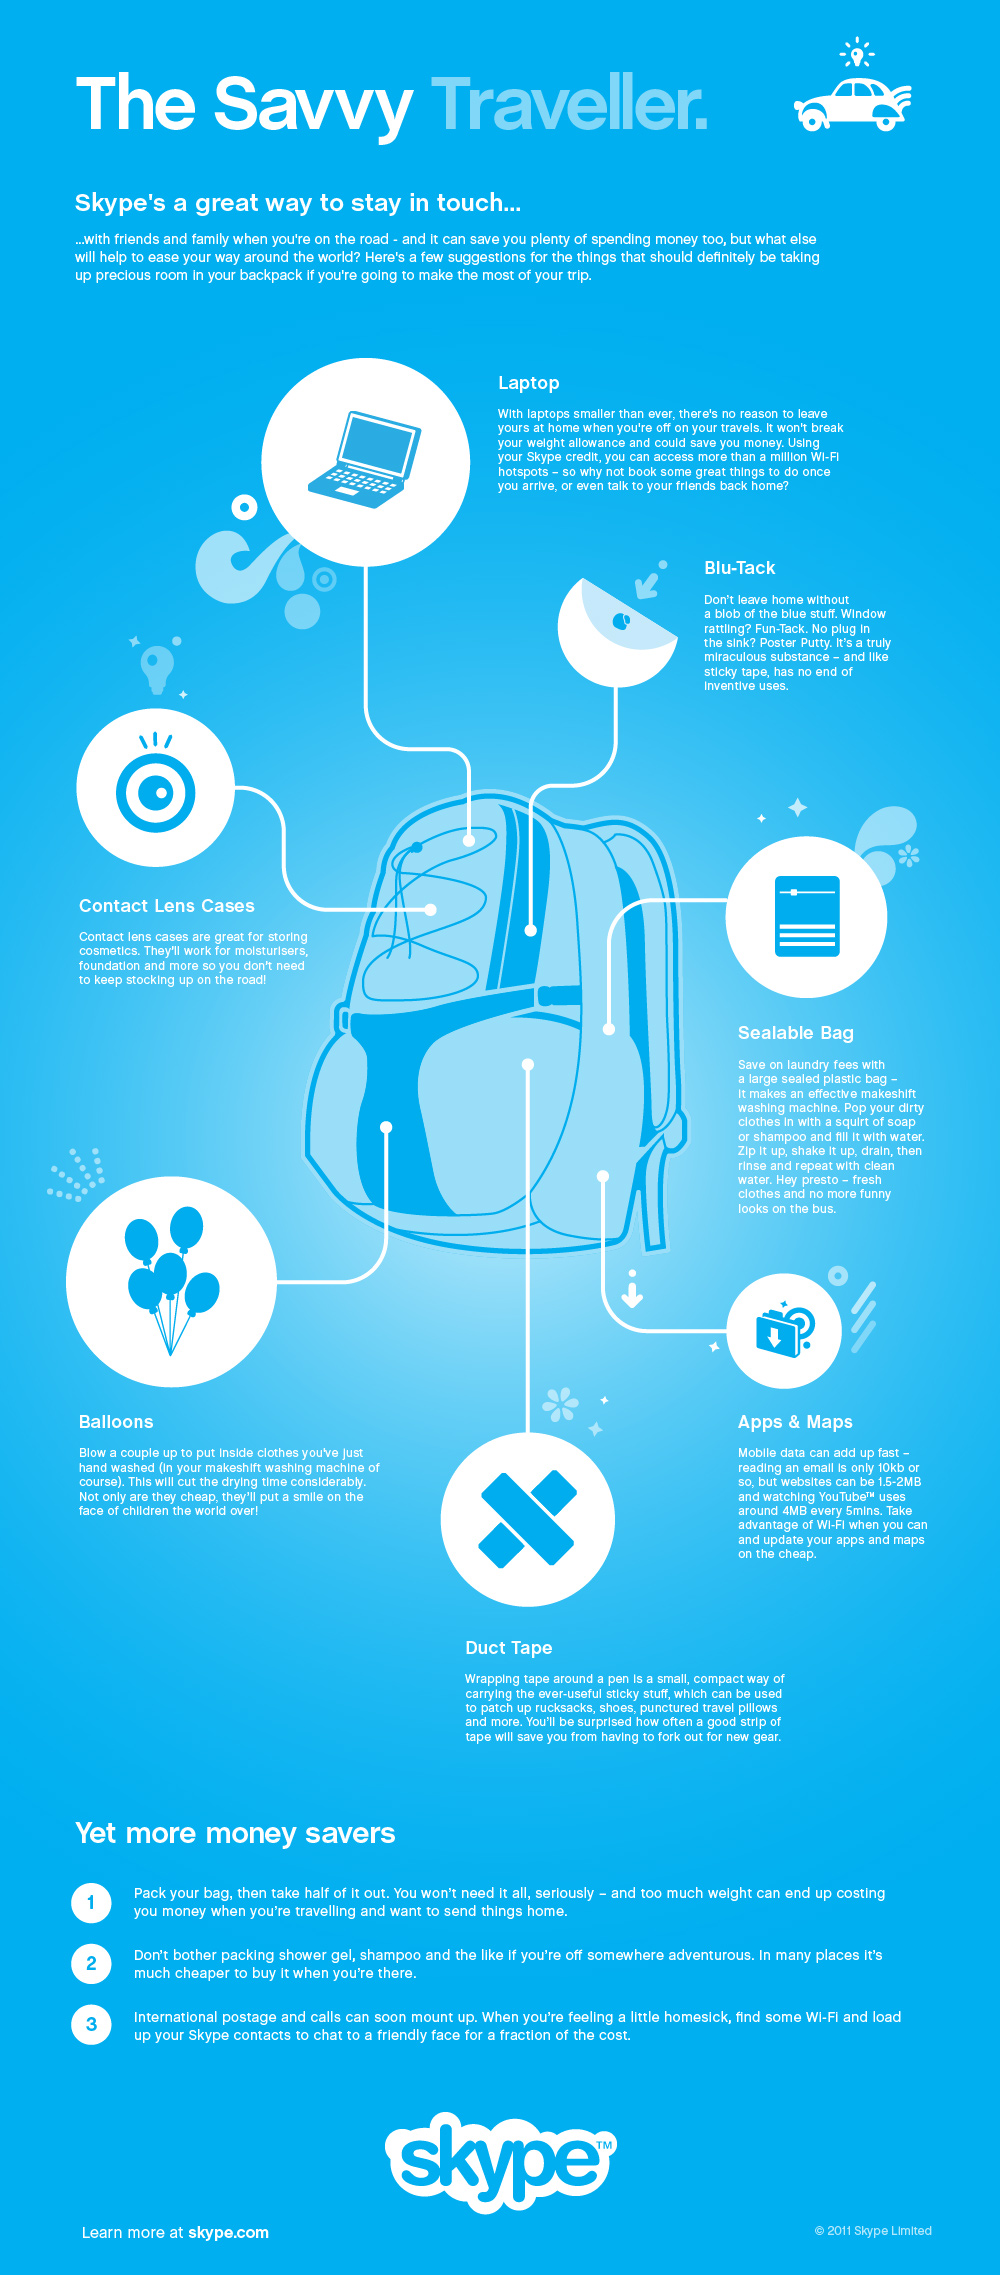 Skype Savvy Traveller